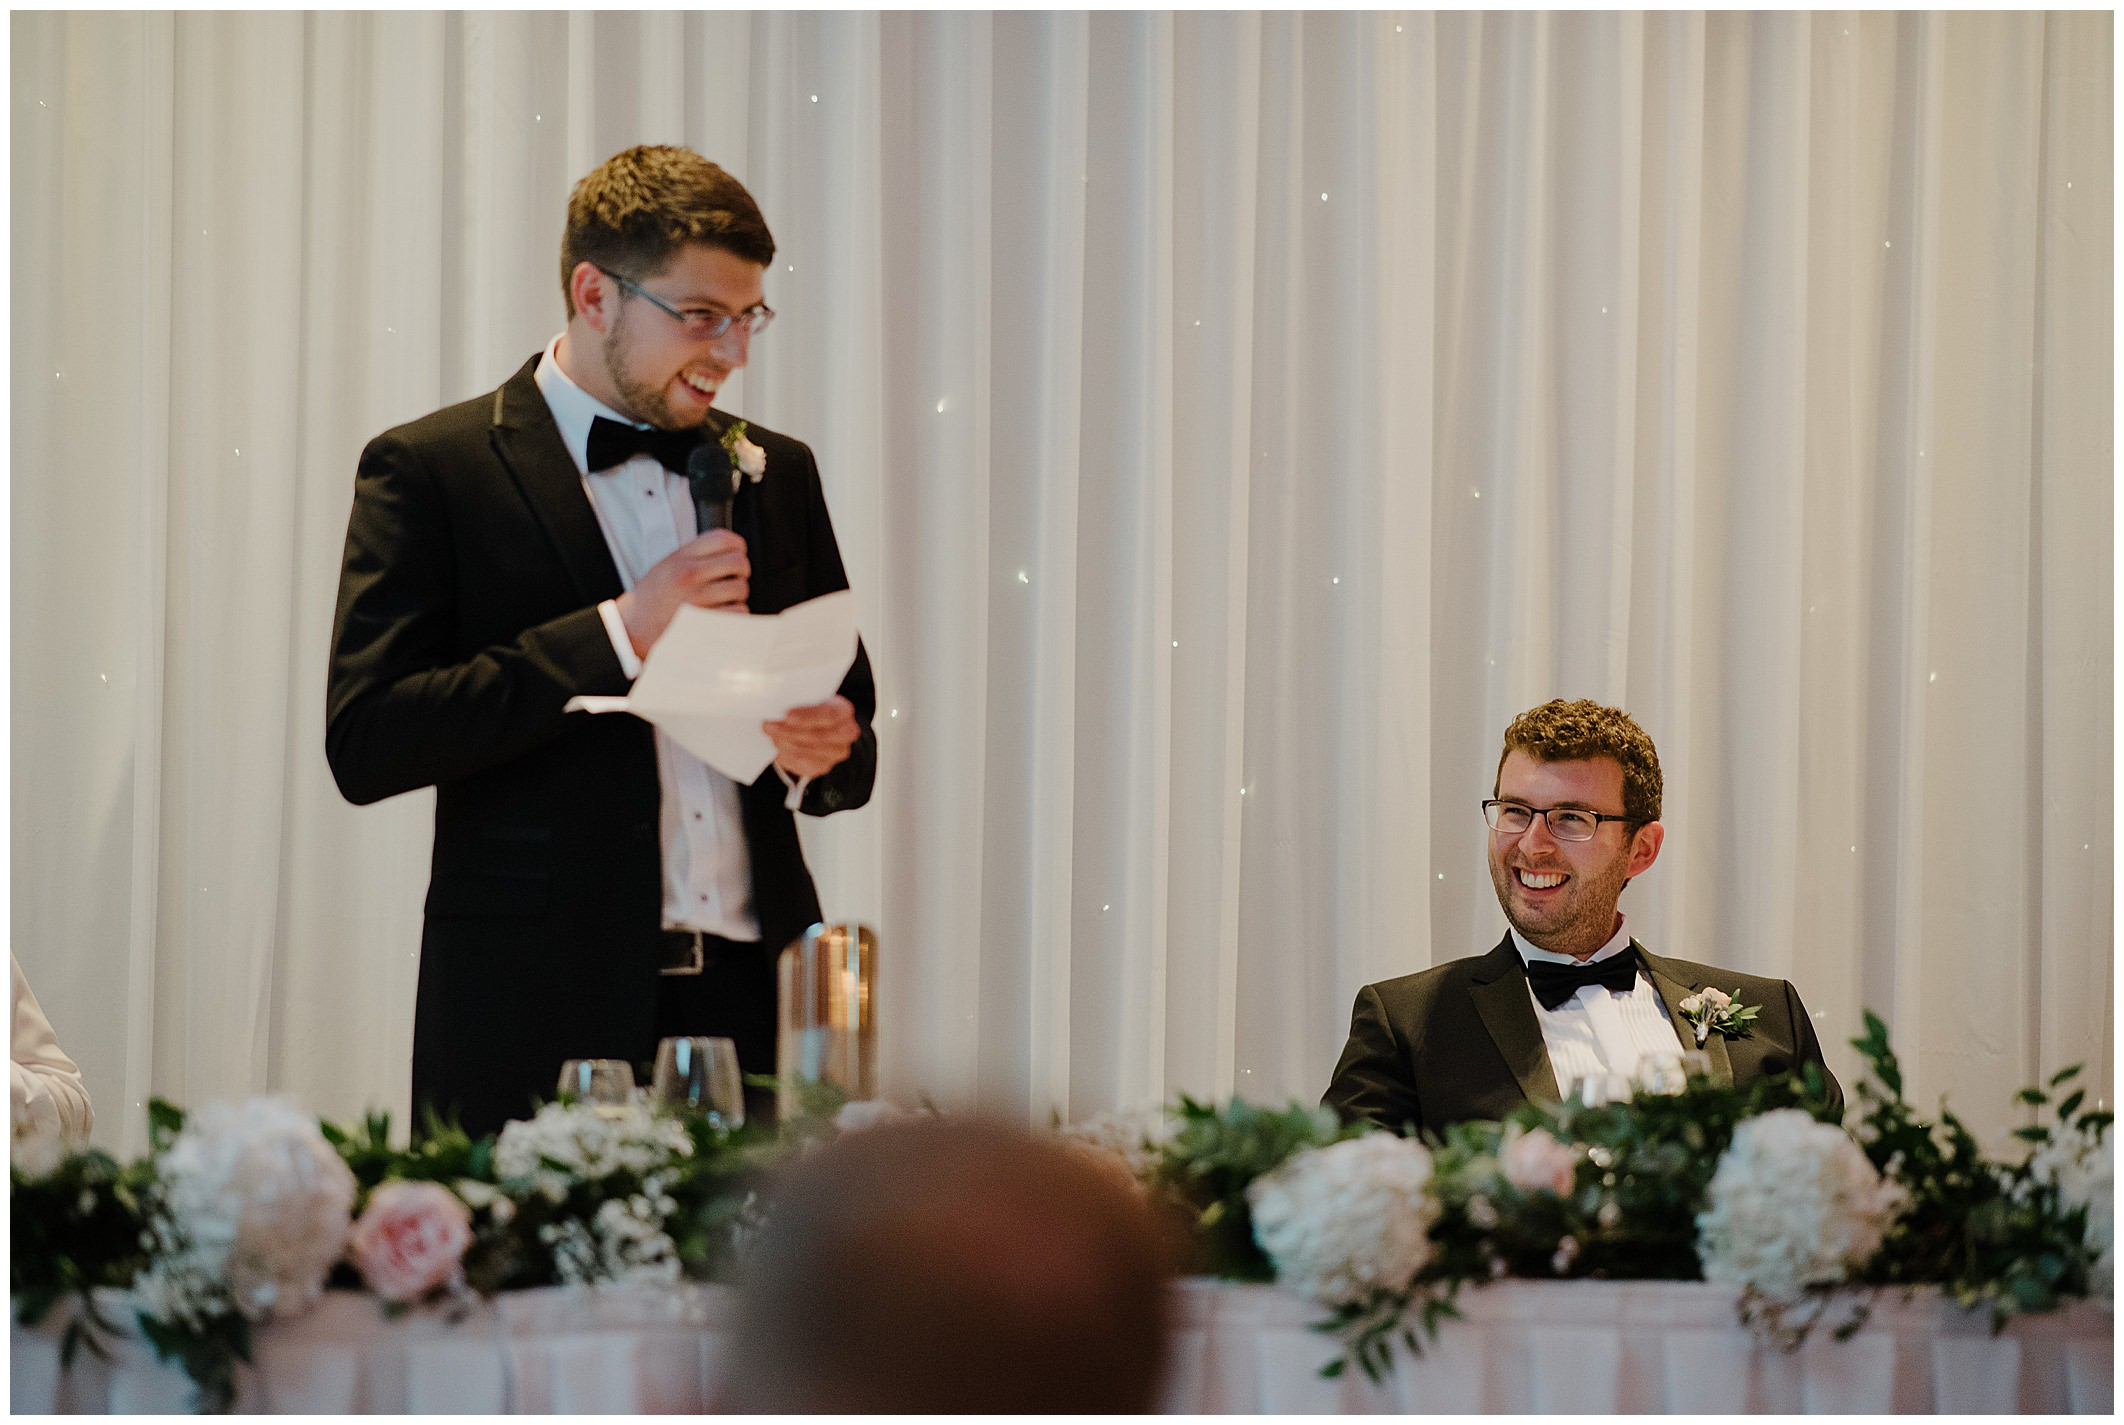 farnham-estate-wedding-jude-browne-photography_0192.jpg